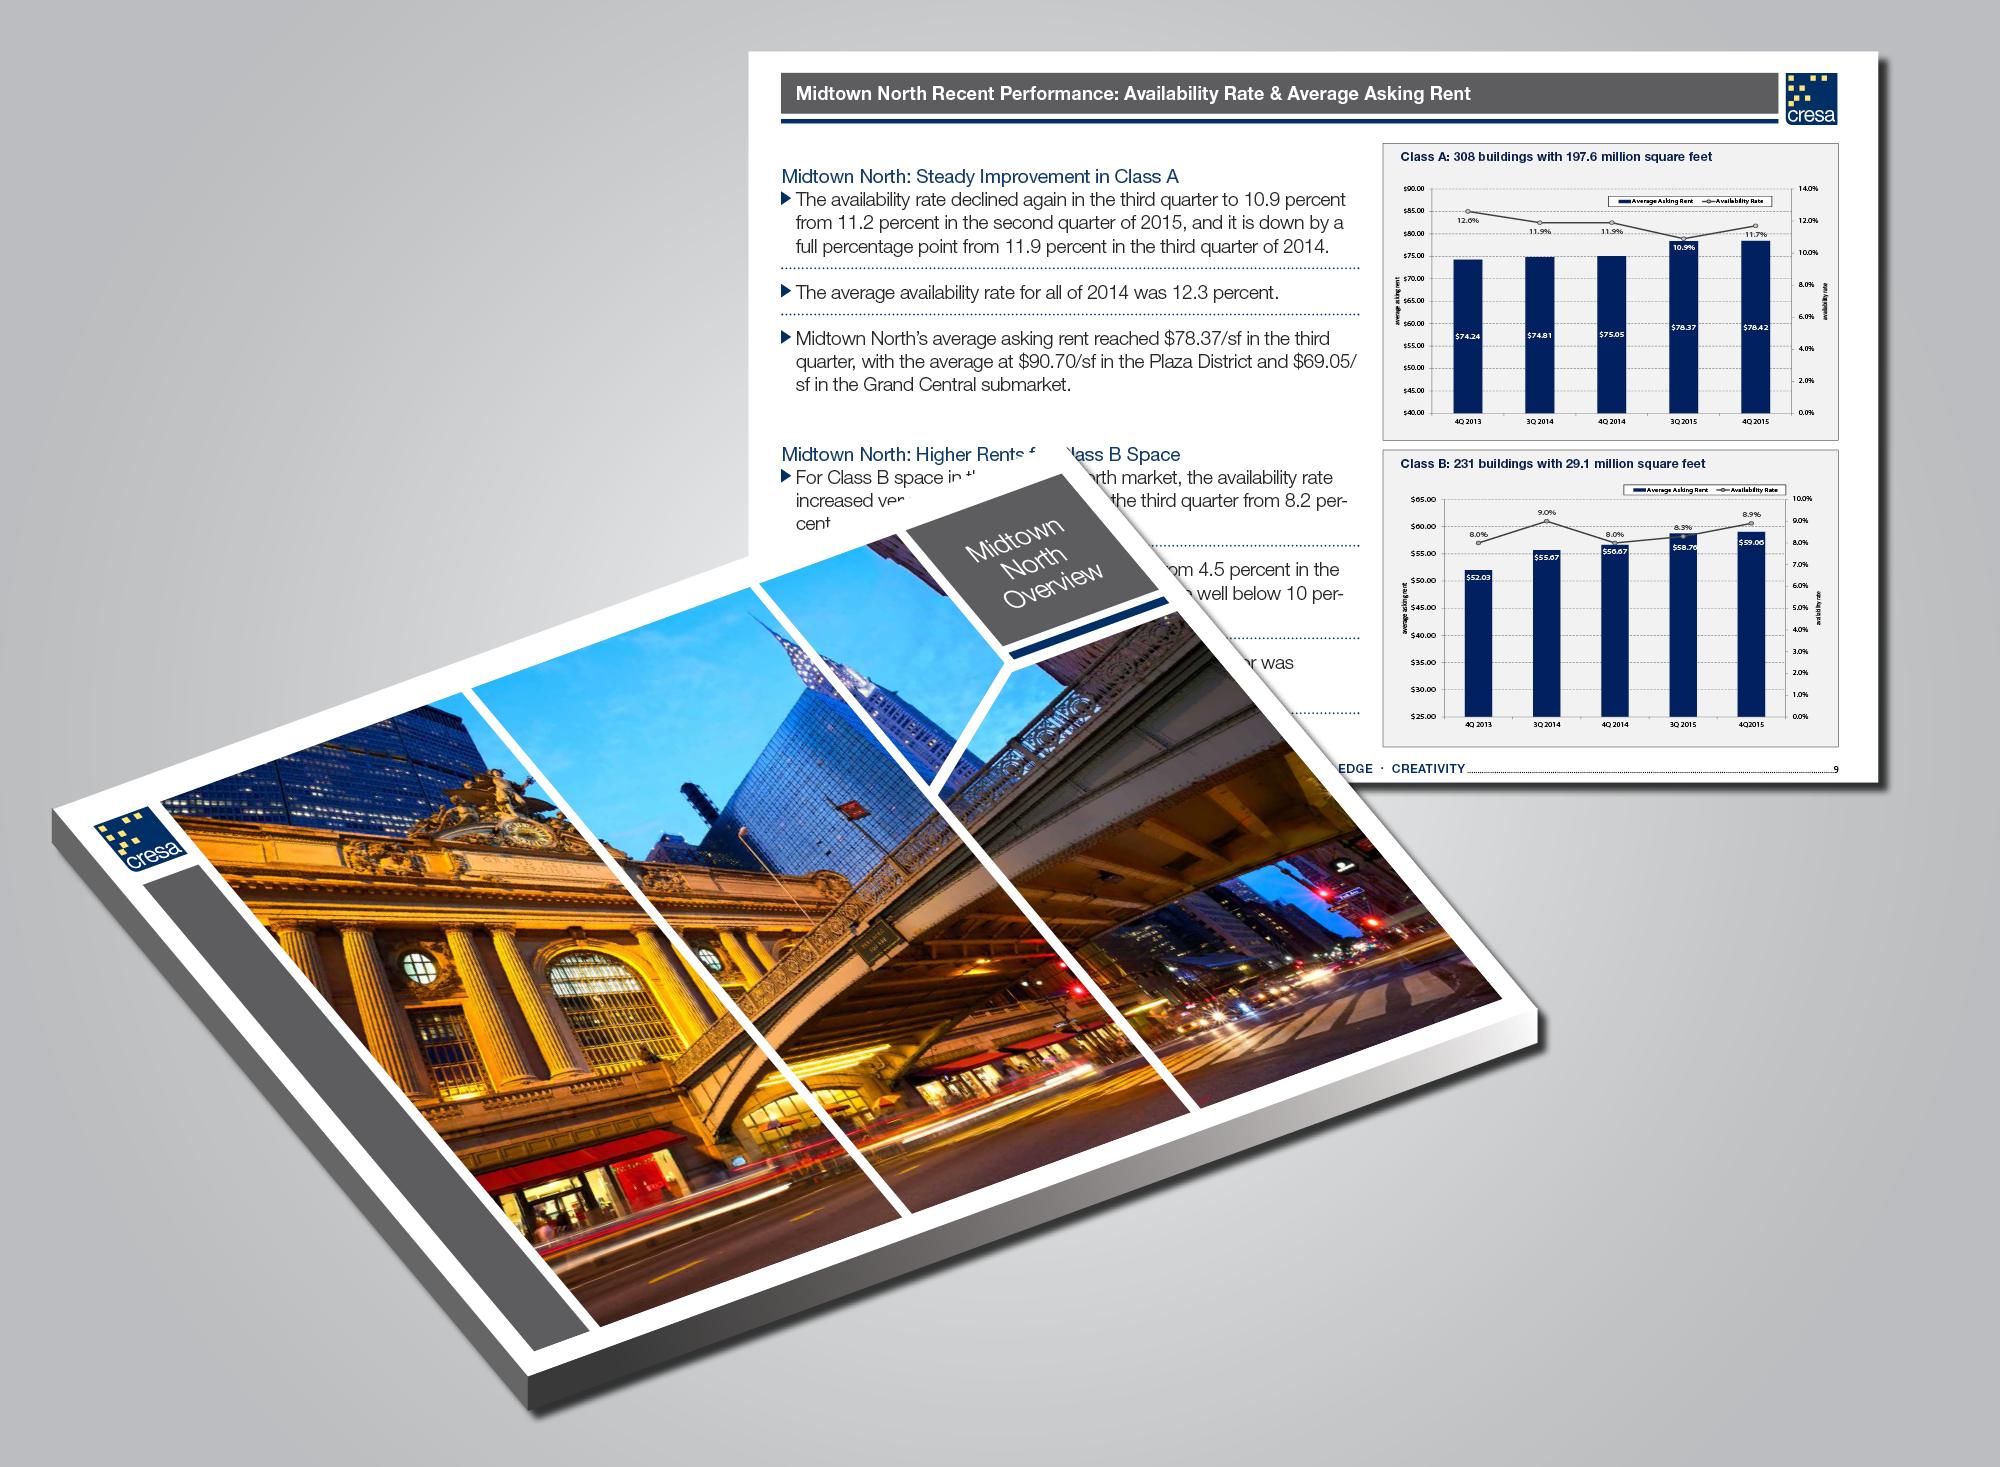 cresa_market_overview_background3.jpg